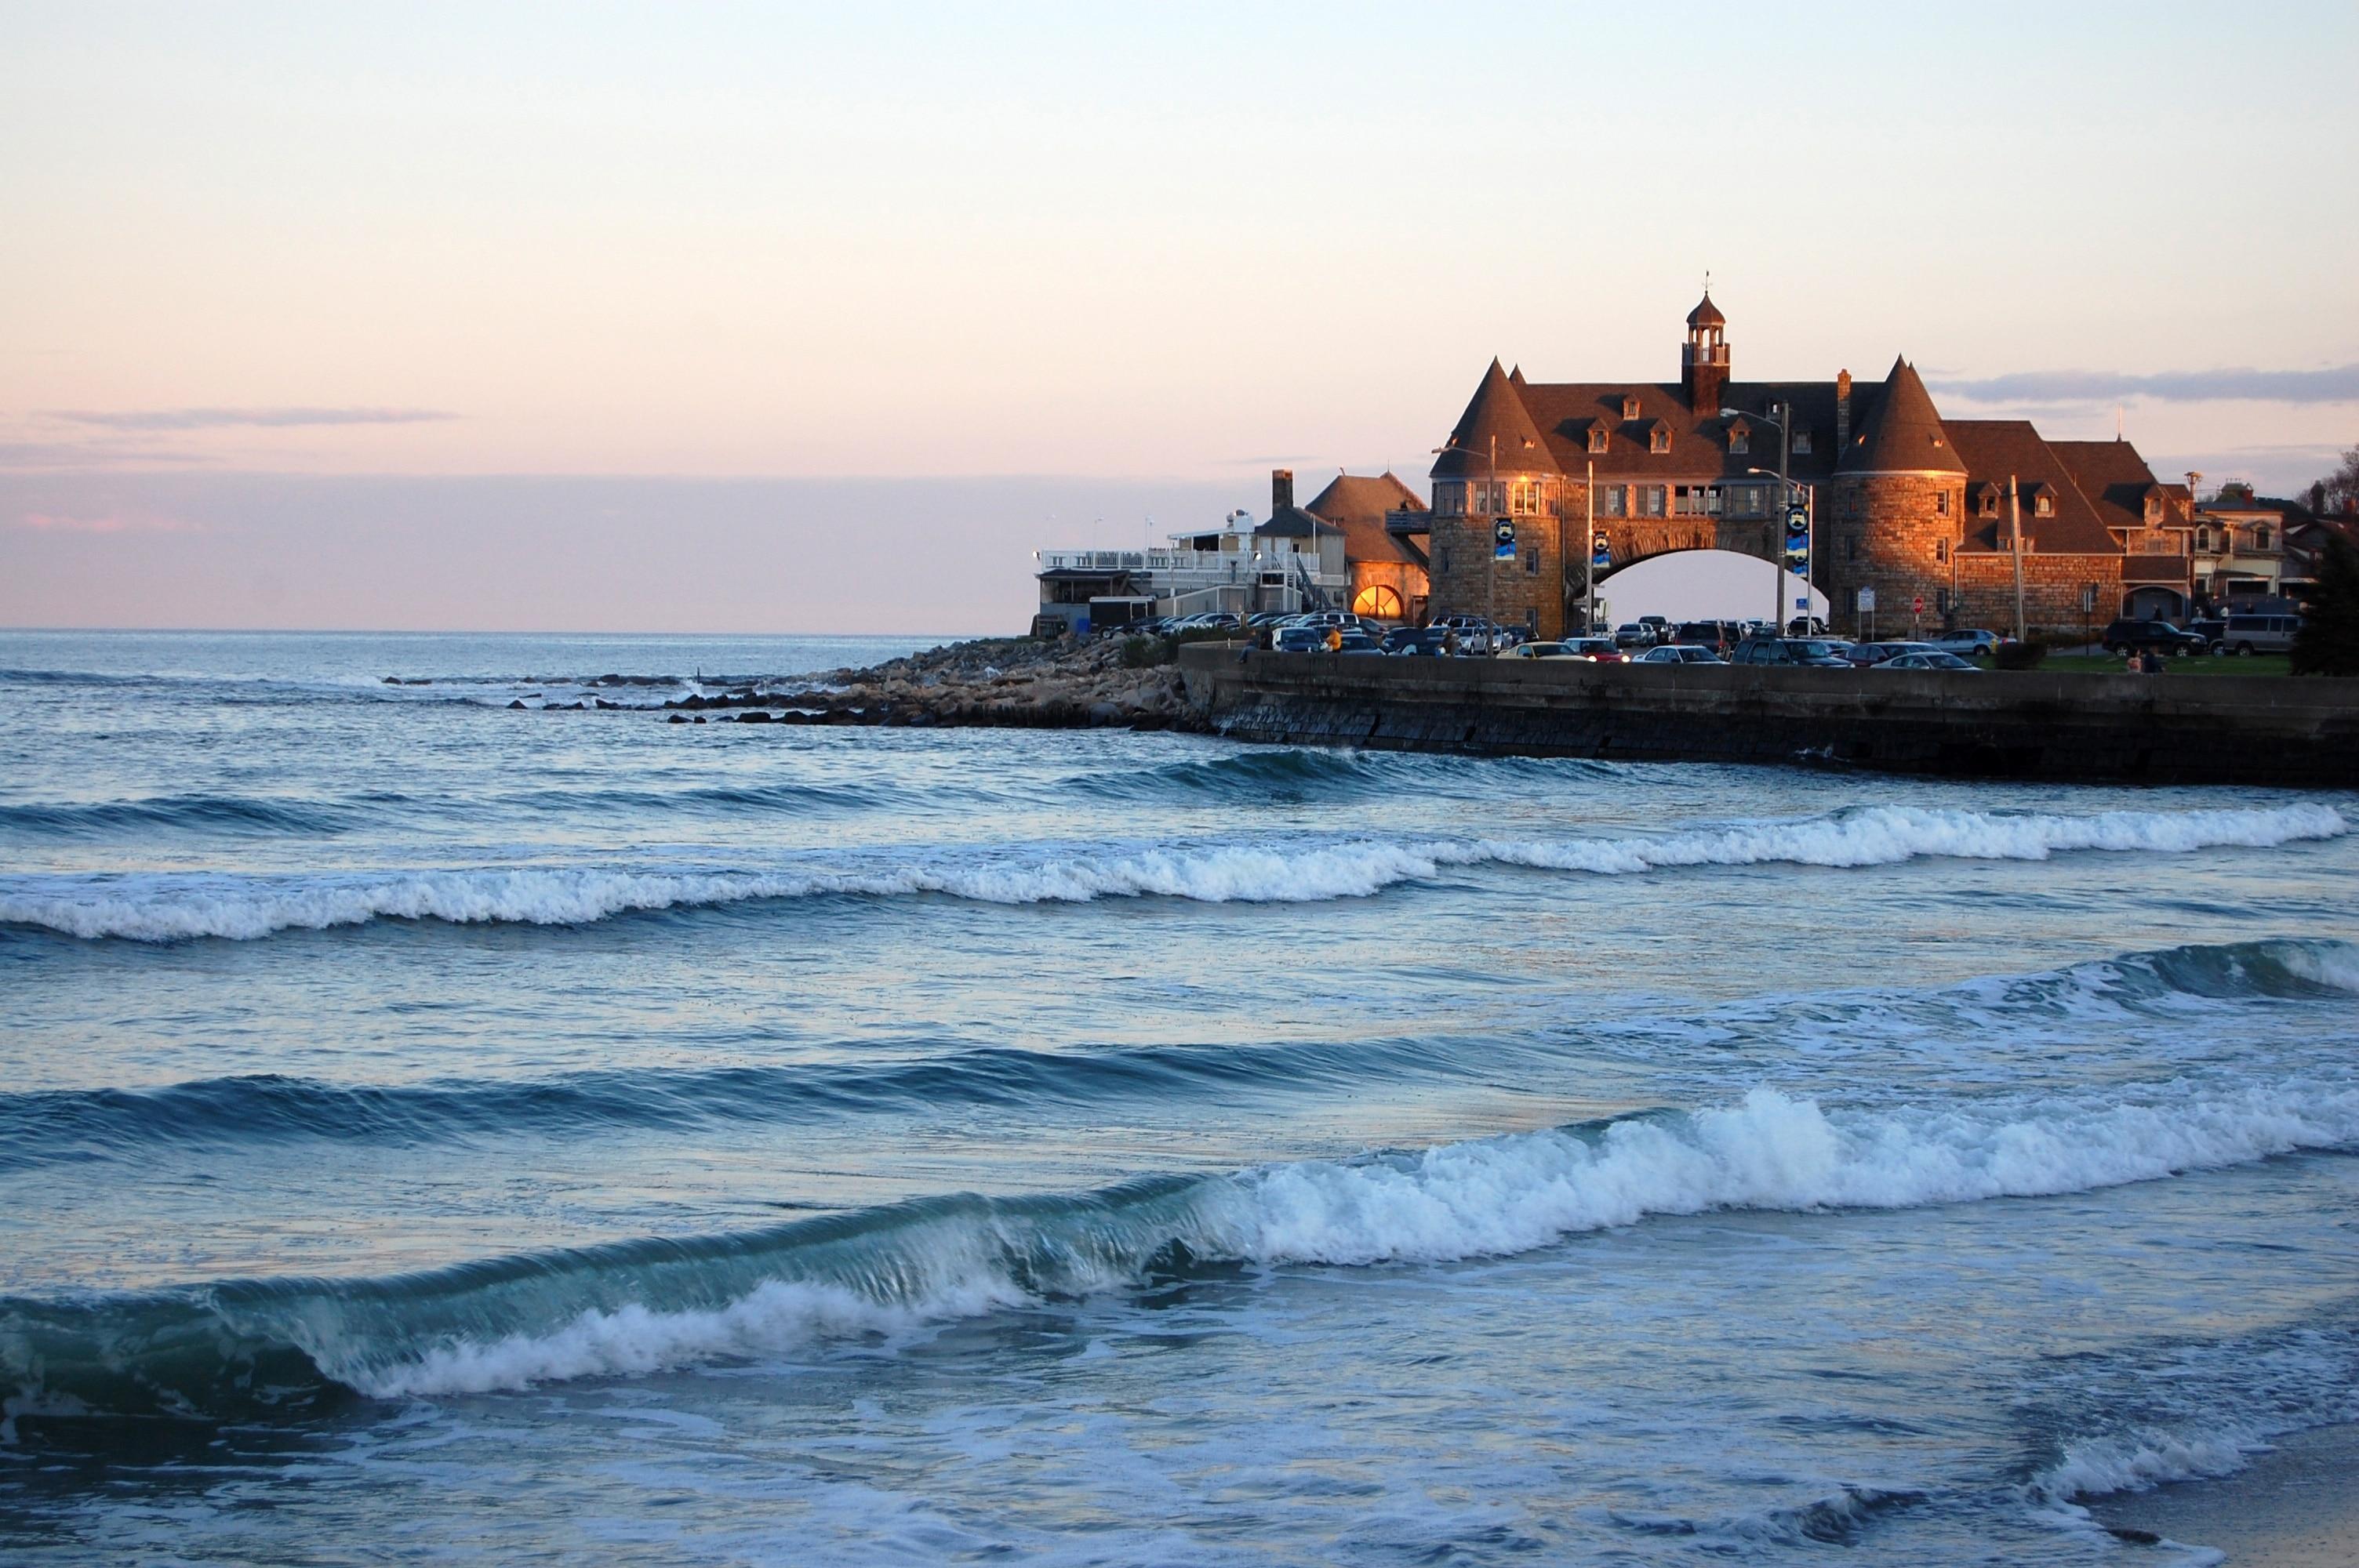 Narragansett Pier, Rhode Island, United States of America